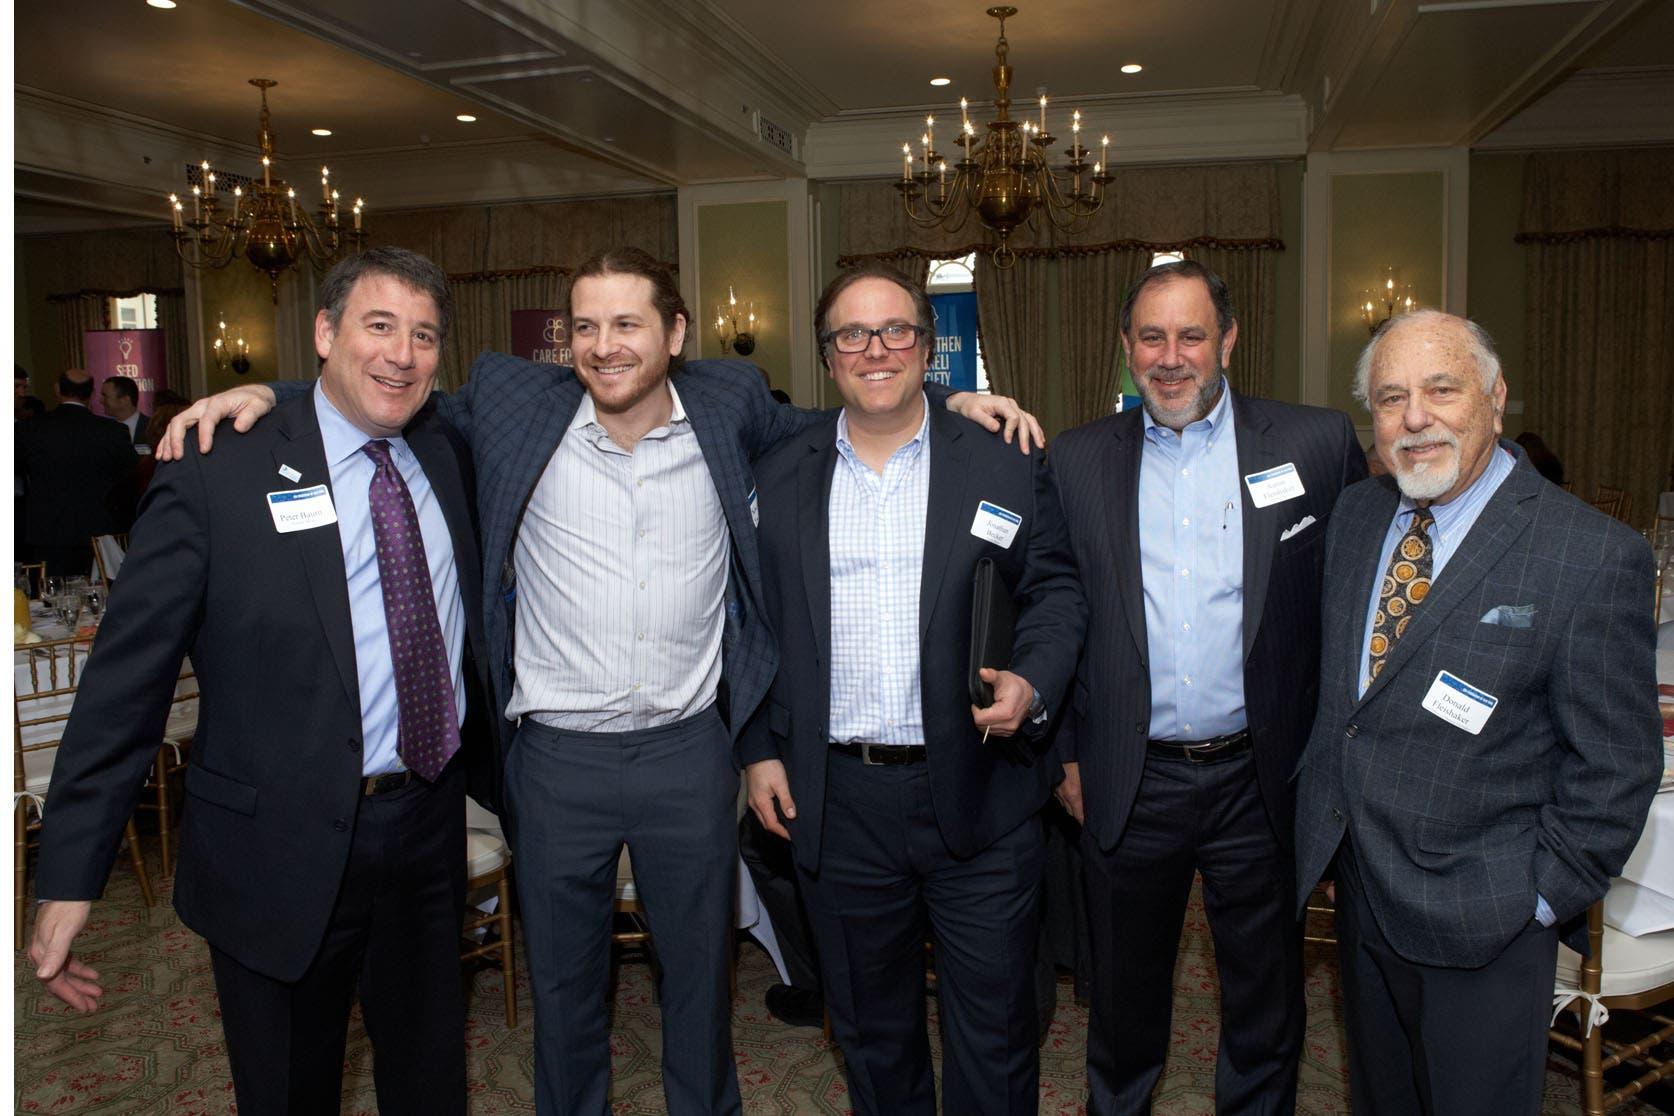 Stanley Fleishman, CEO of Jetro and Restaurant Depot, Speaks